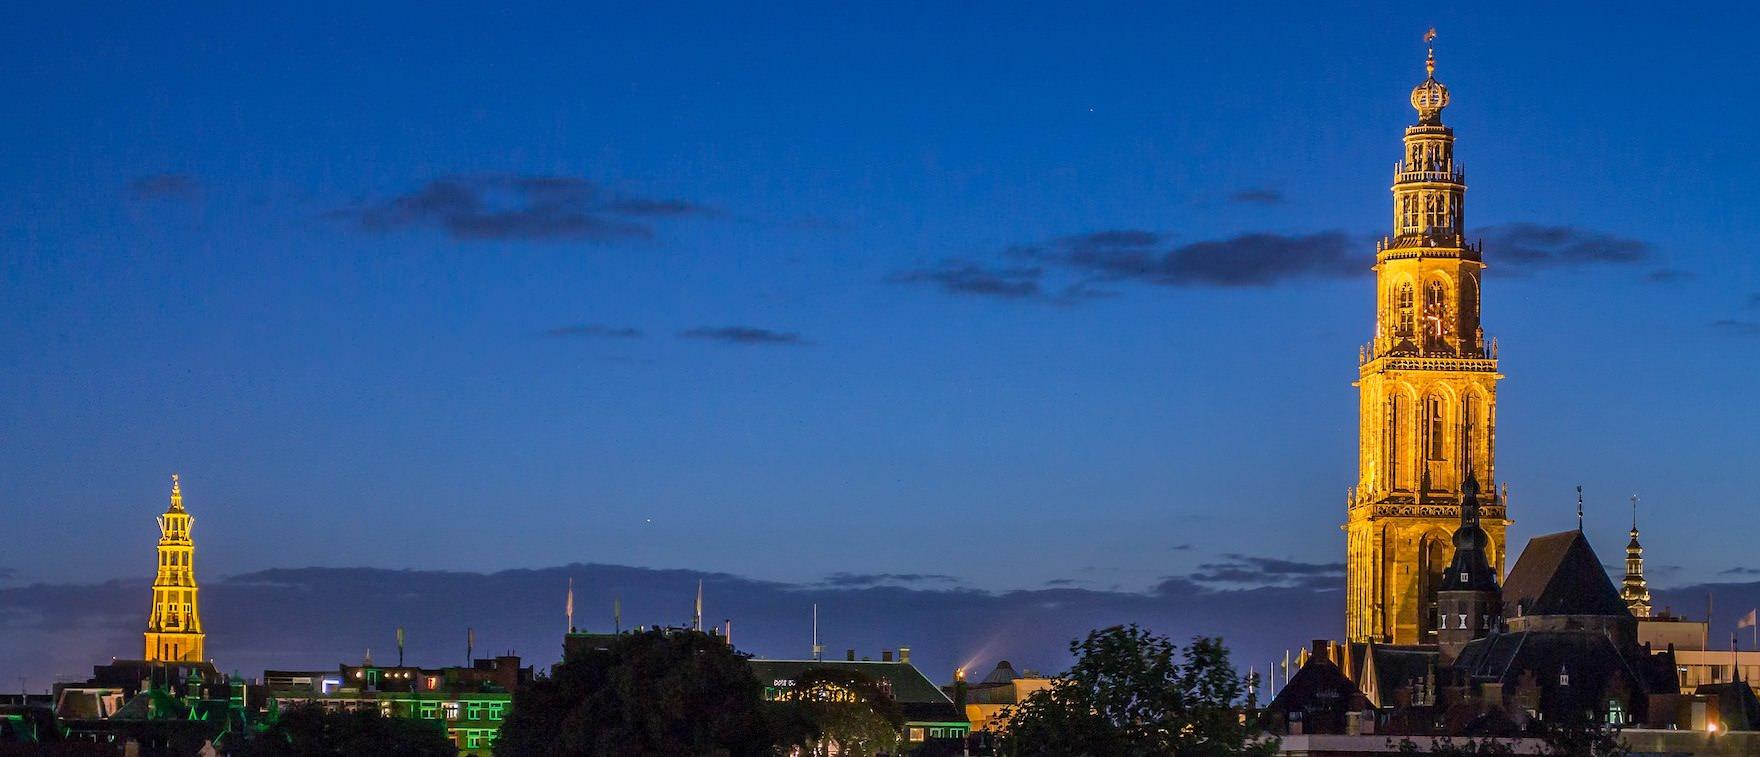 Groningen bei Nacht (Aa-Kerk und Martiniturm)